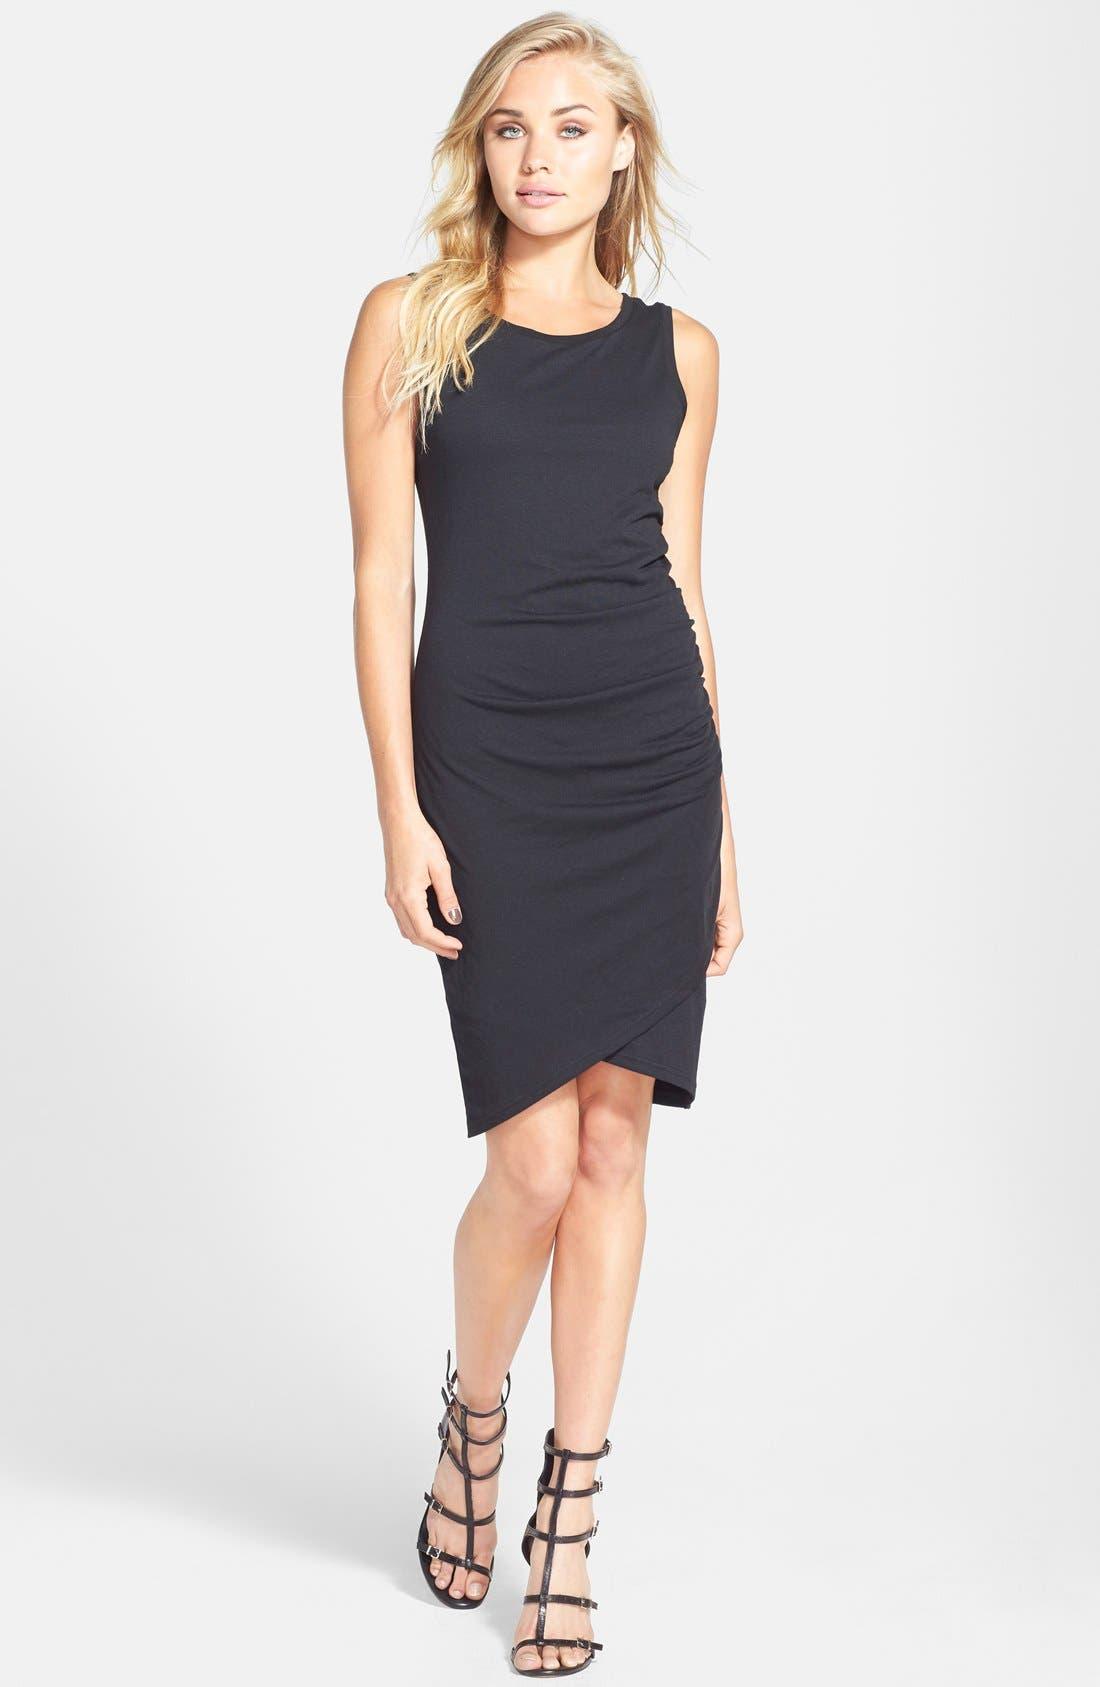 Rouched tank dress black